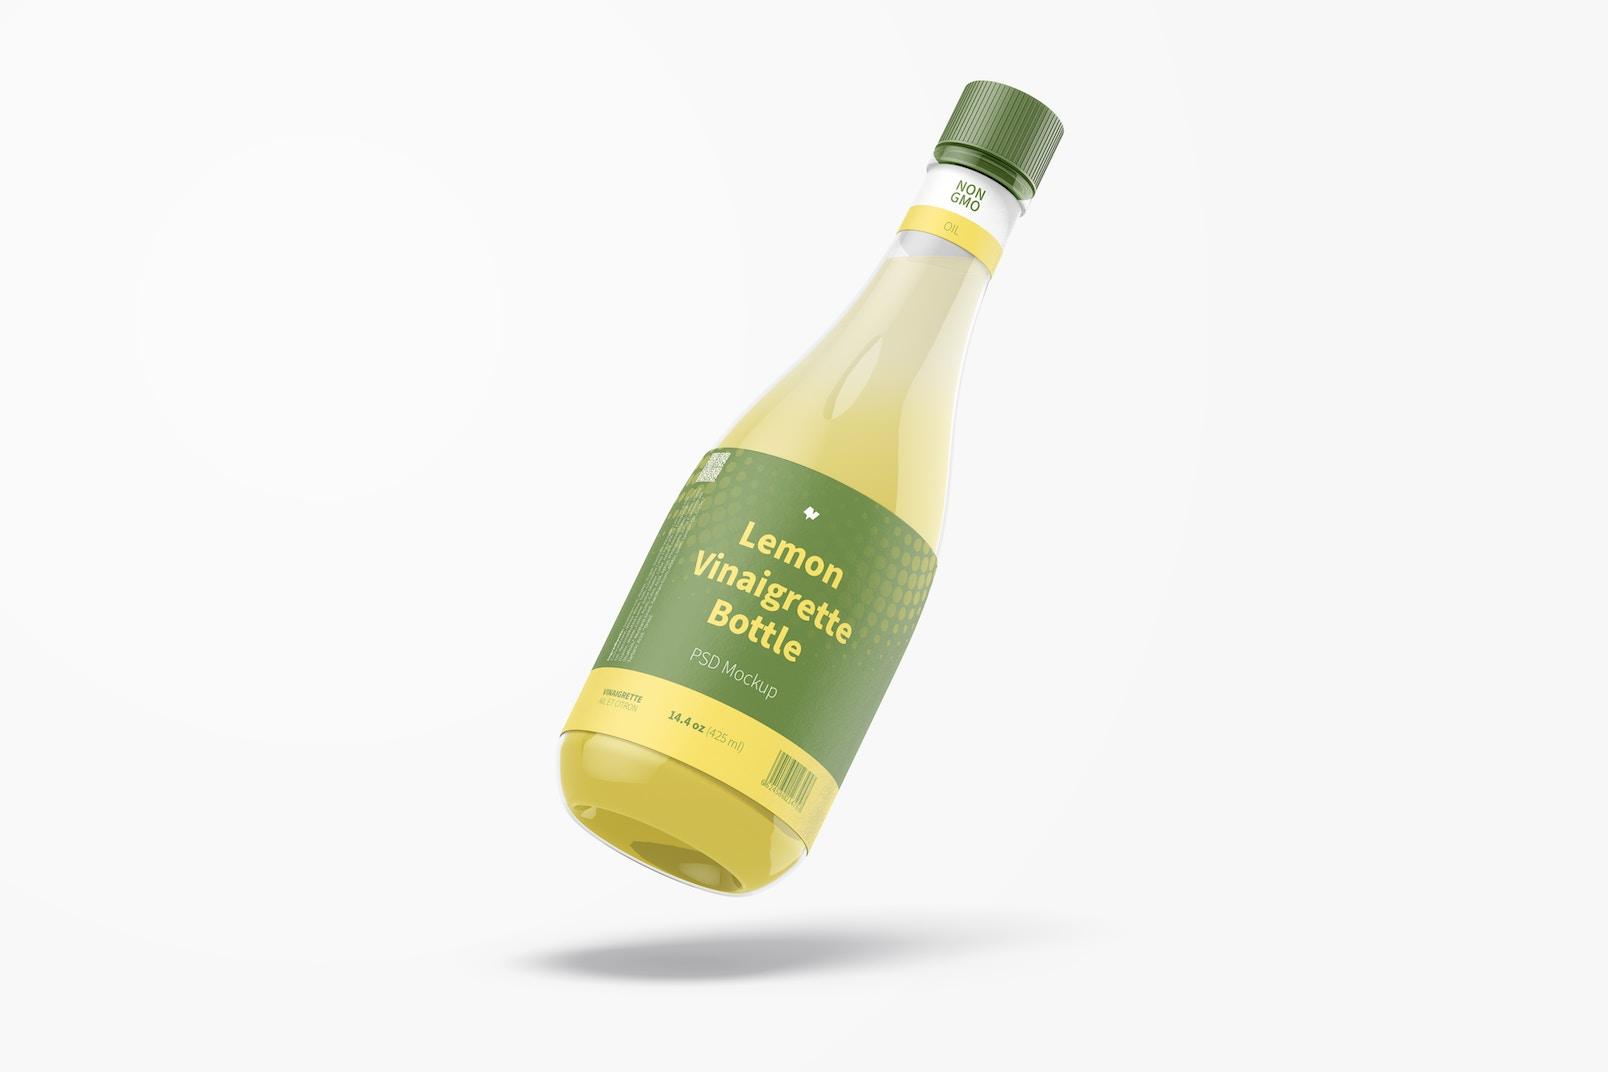 14.5 oz Lemon Vinaigrette Bottle Mockup, Falling